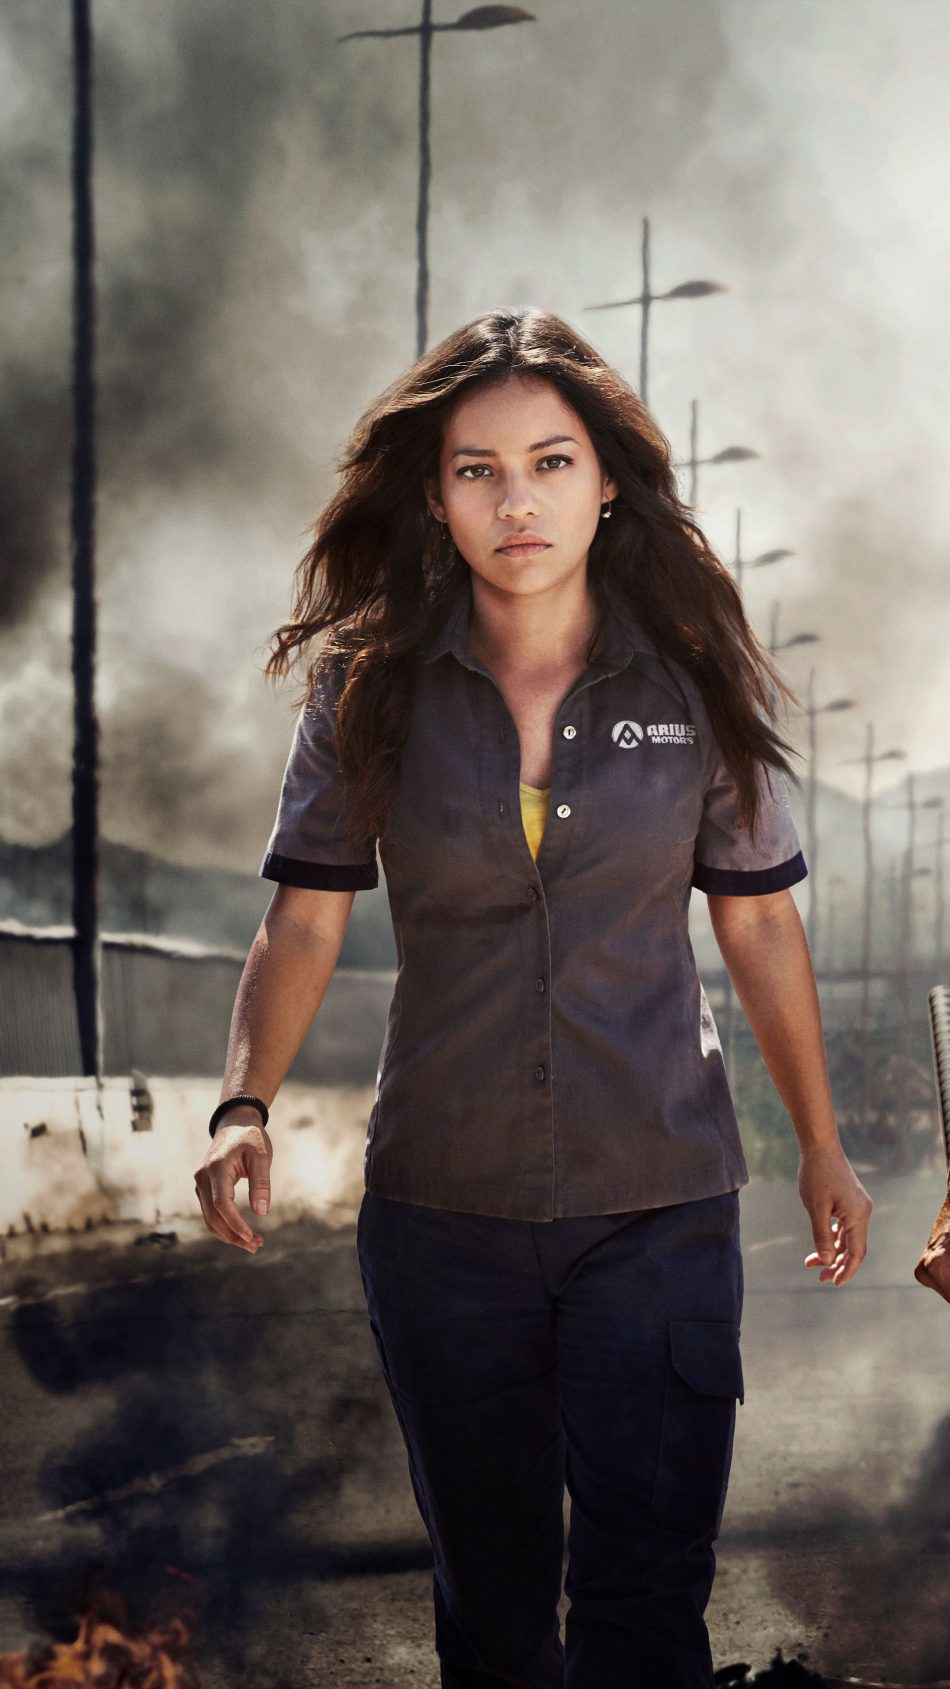 Natalia Reyes In Terminator Dark Fate 2019 4K Ultra HD Mobile Wallpaper